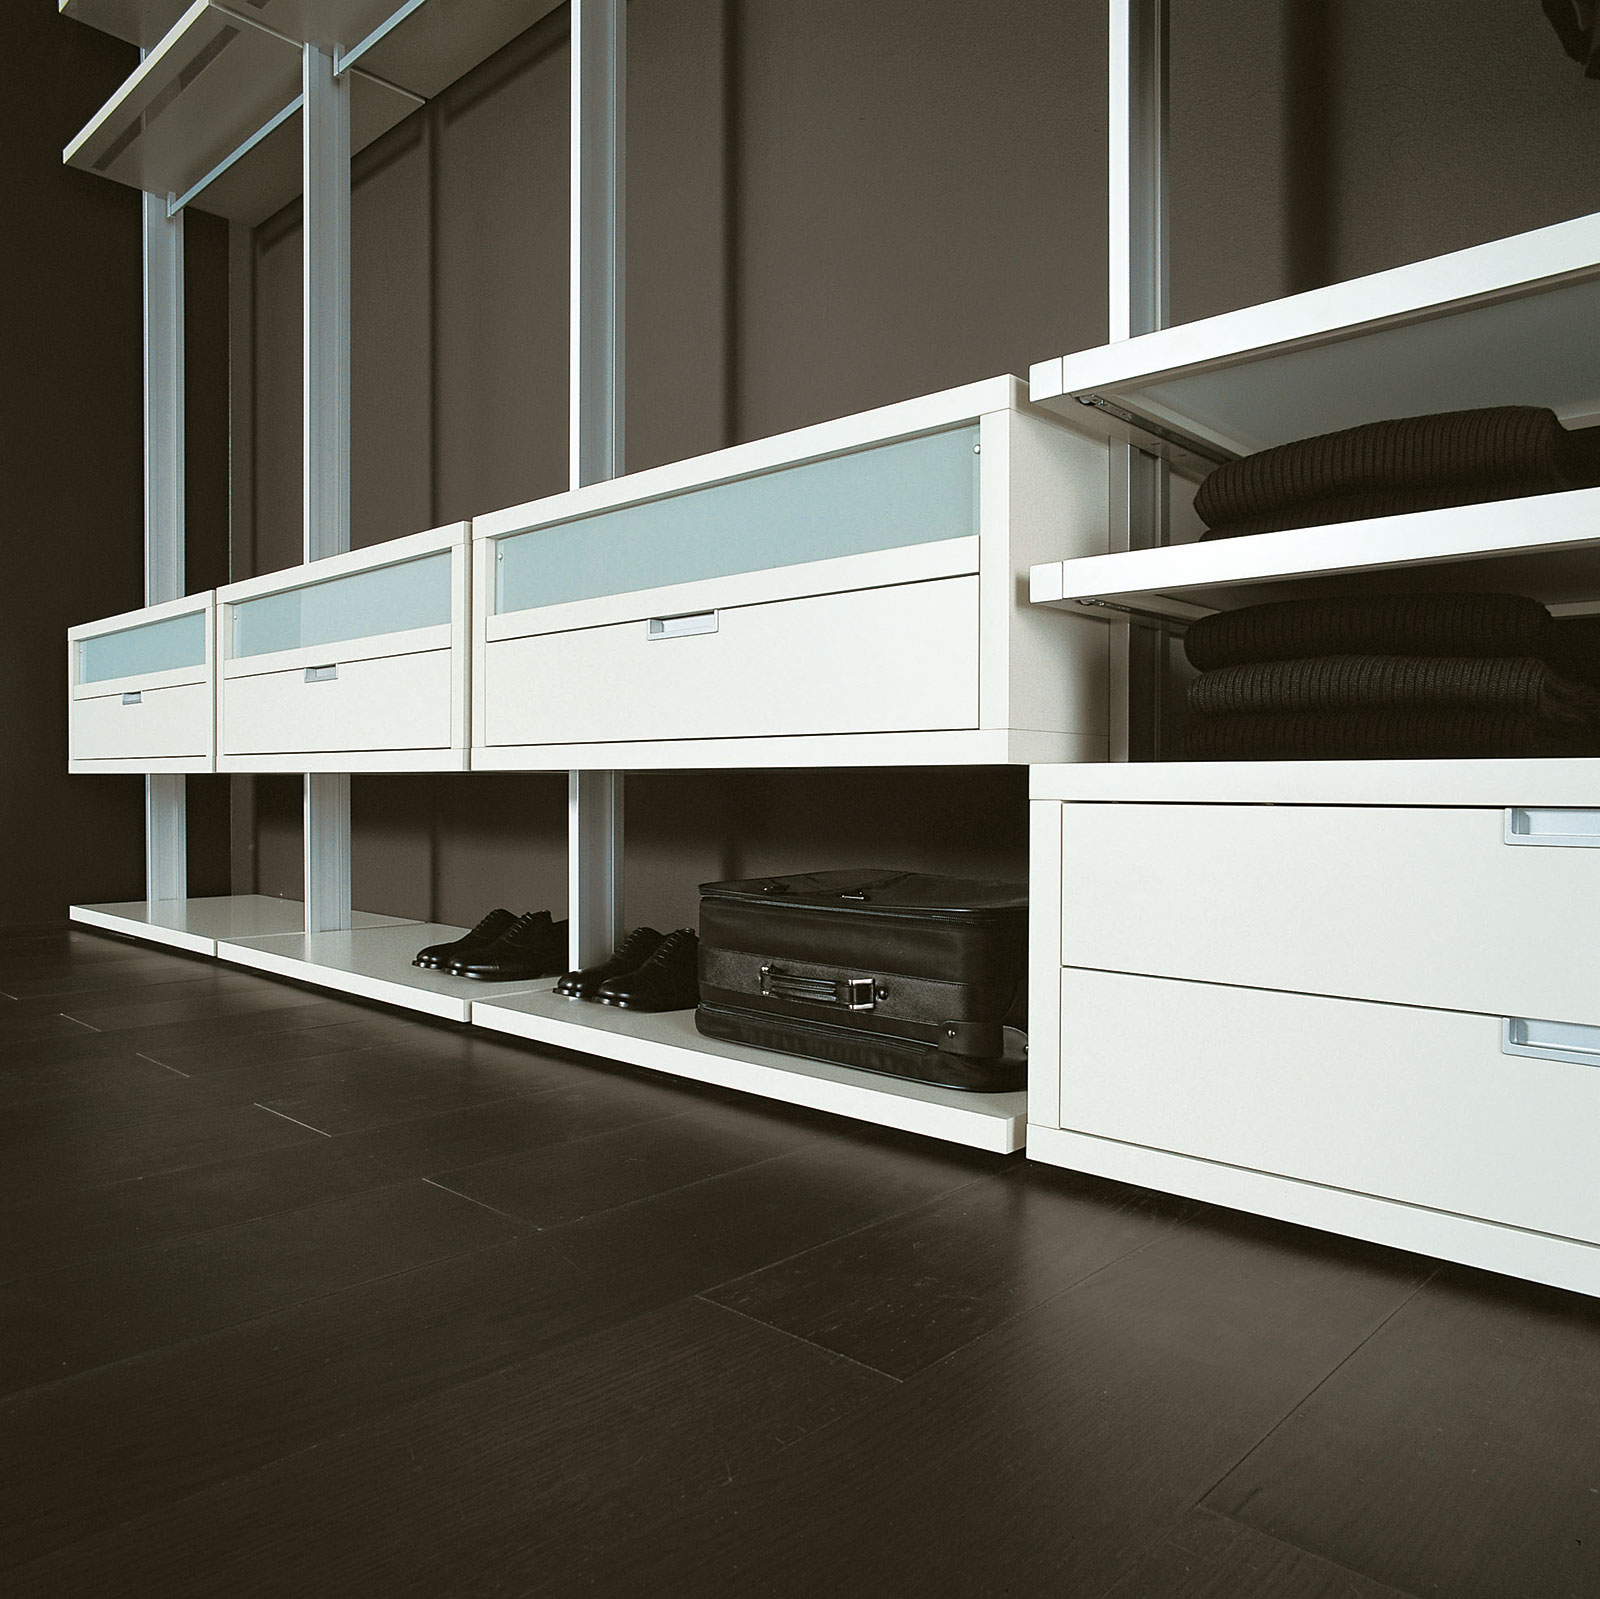 Cabina armadio su misura porte sistemi henry glass - Cabina armadio su misura ...